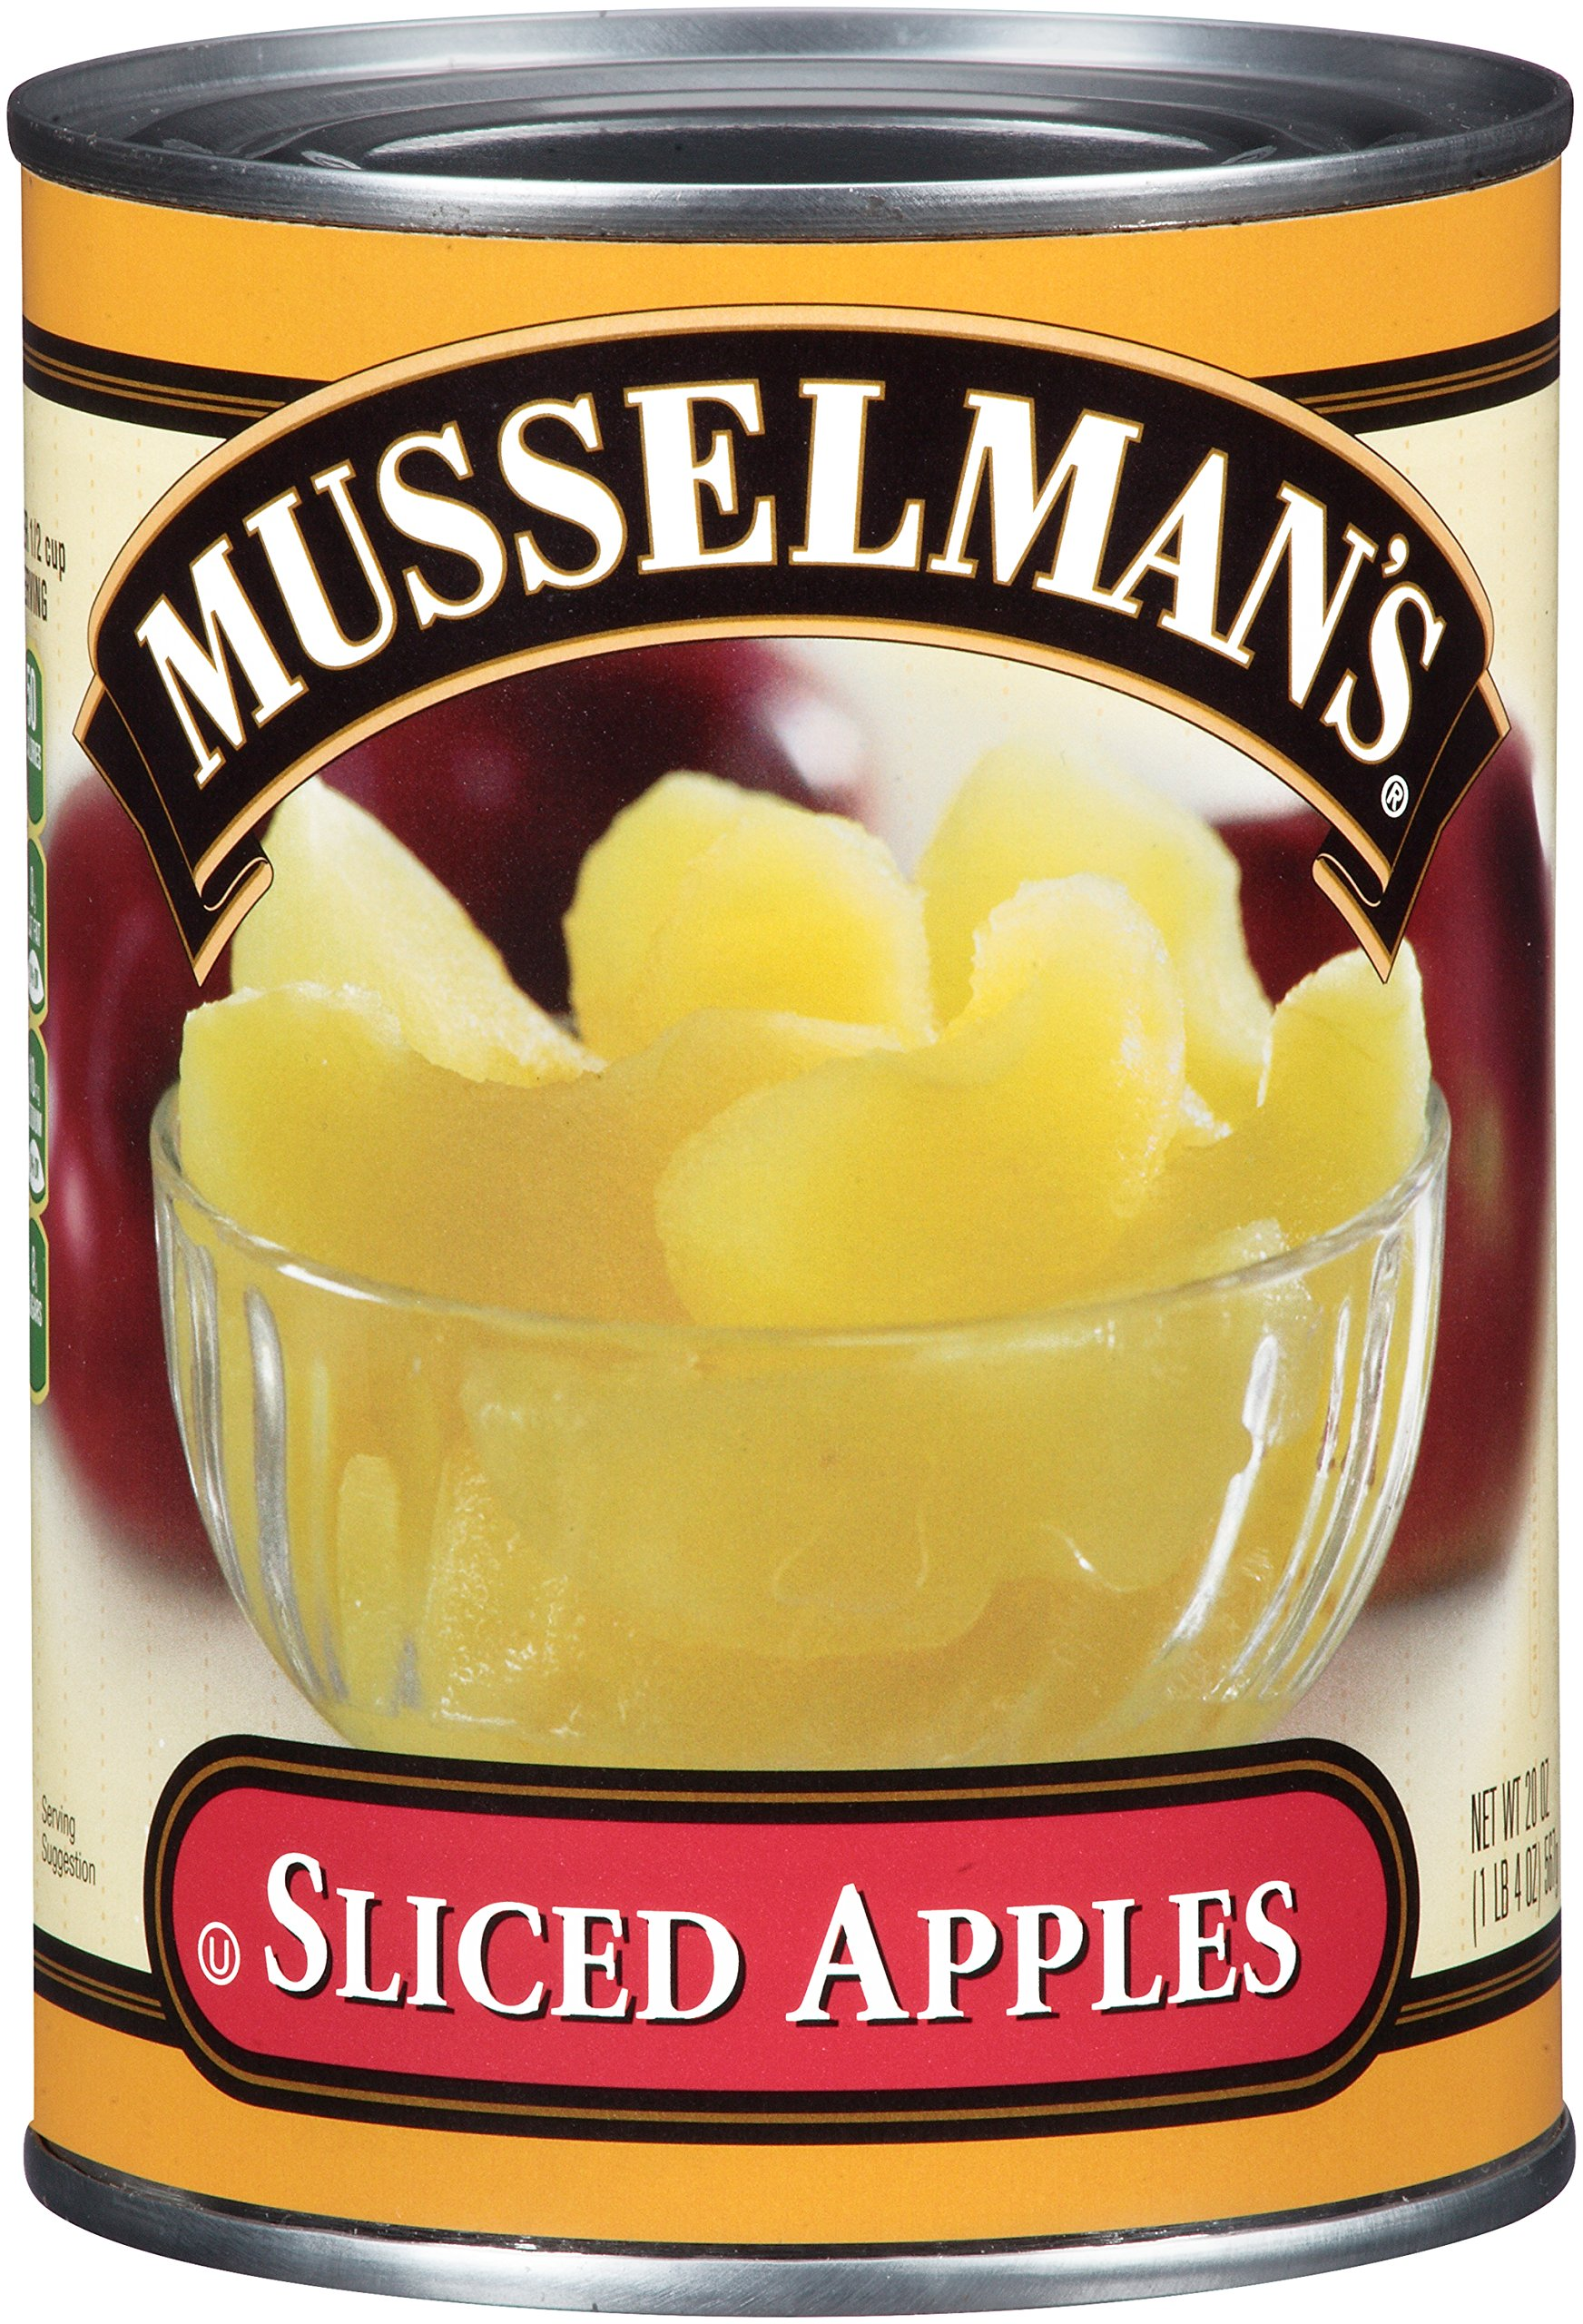 Musselmans Sliced Apple in Water, 20 Ounce (Pack of 12) by Musselmans